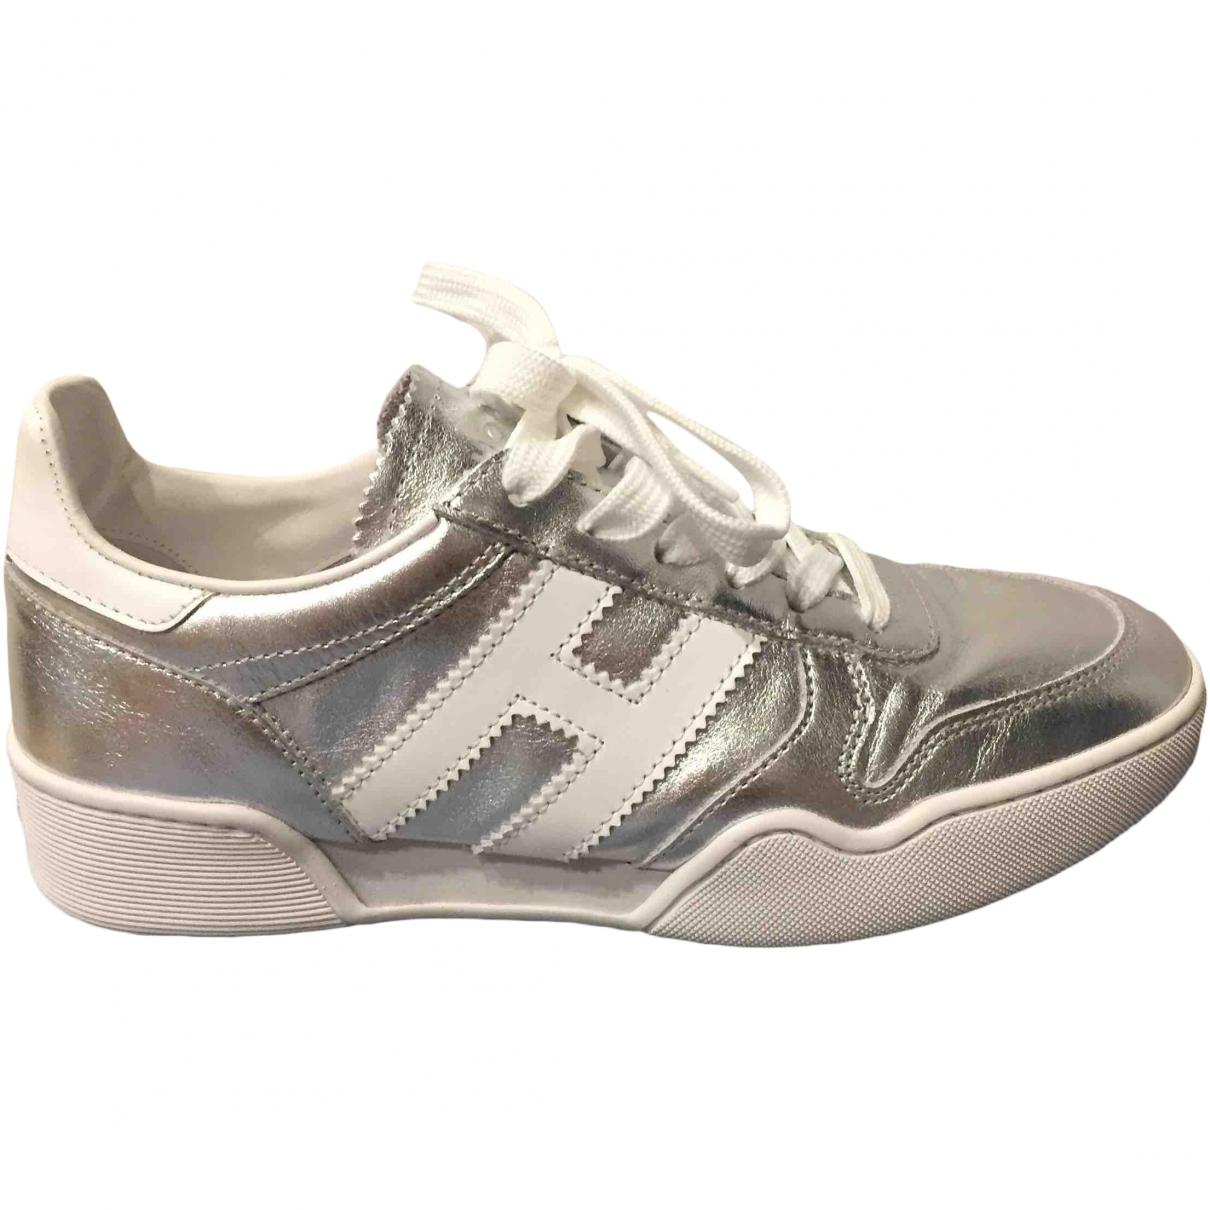 Hogan \N Silver Leather Trainers for Women 35.5 EU